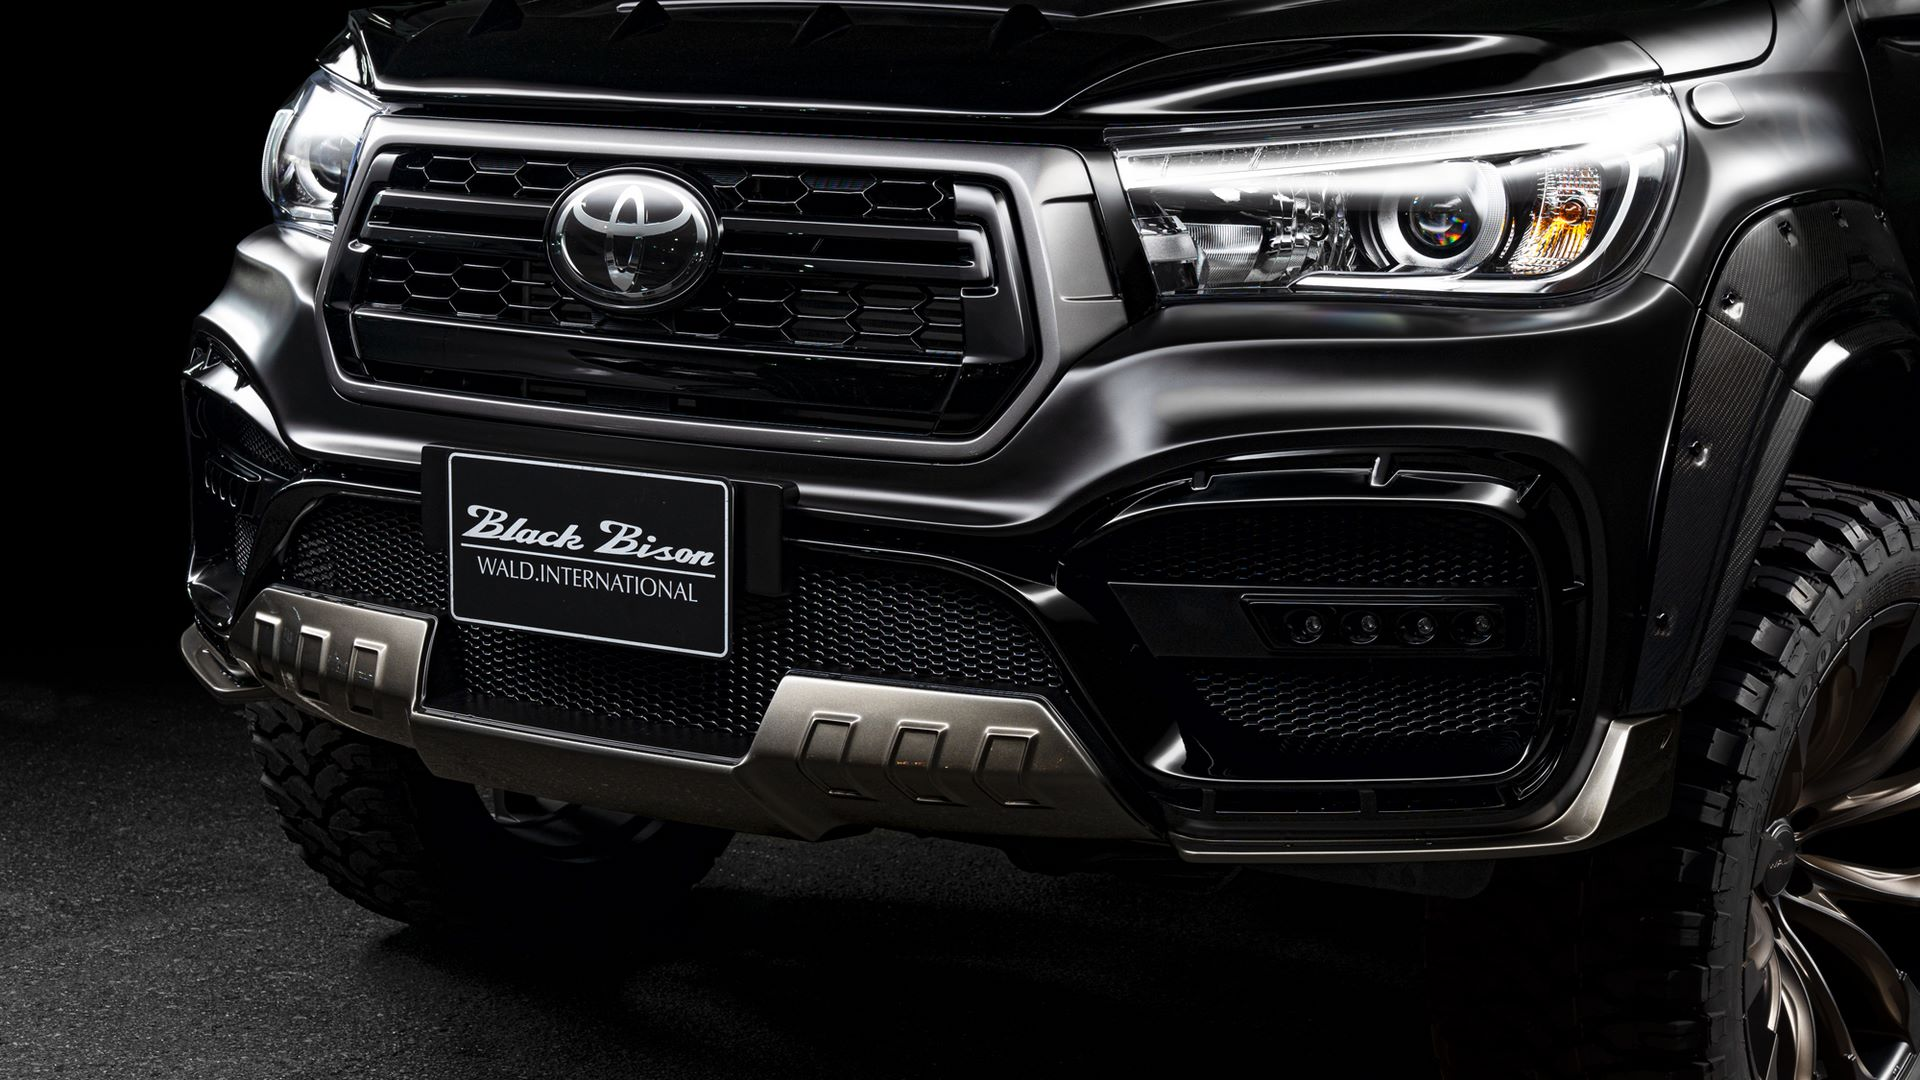 Toyota-Hilux-Black-Bison-by-Wald-International-2